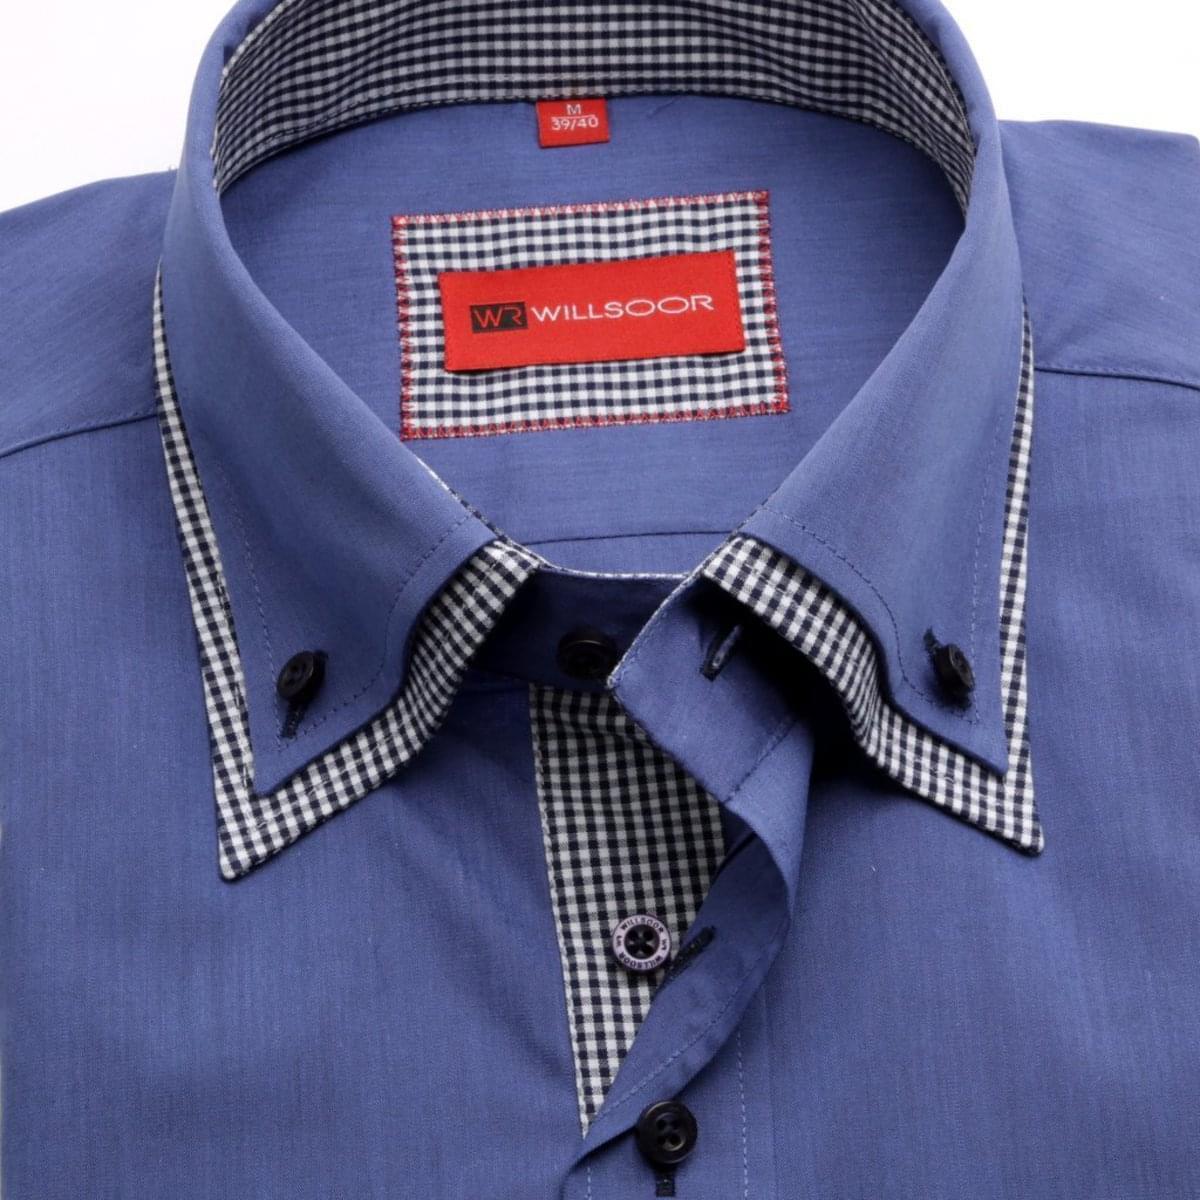 Willsoor Pánská košile WR Slim Fit (výška 176-182) 1990 176-182 / M (39/40)